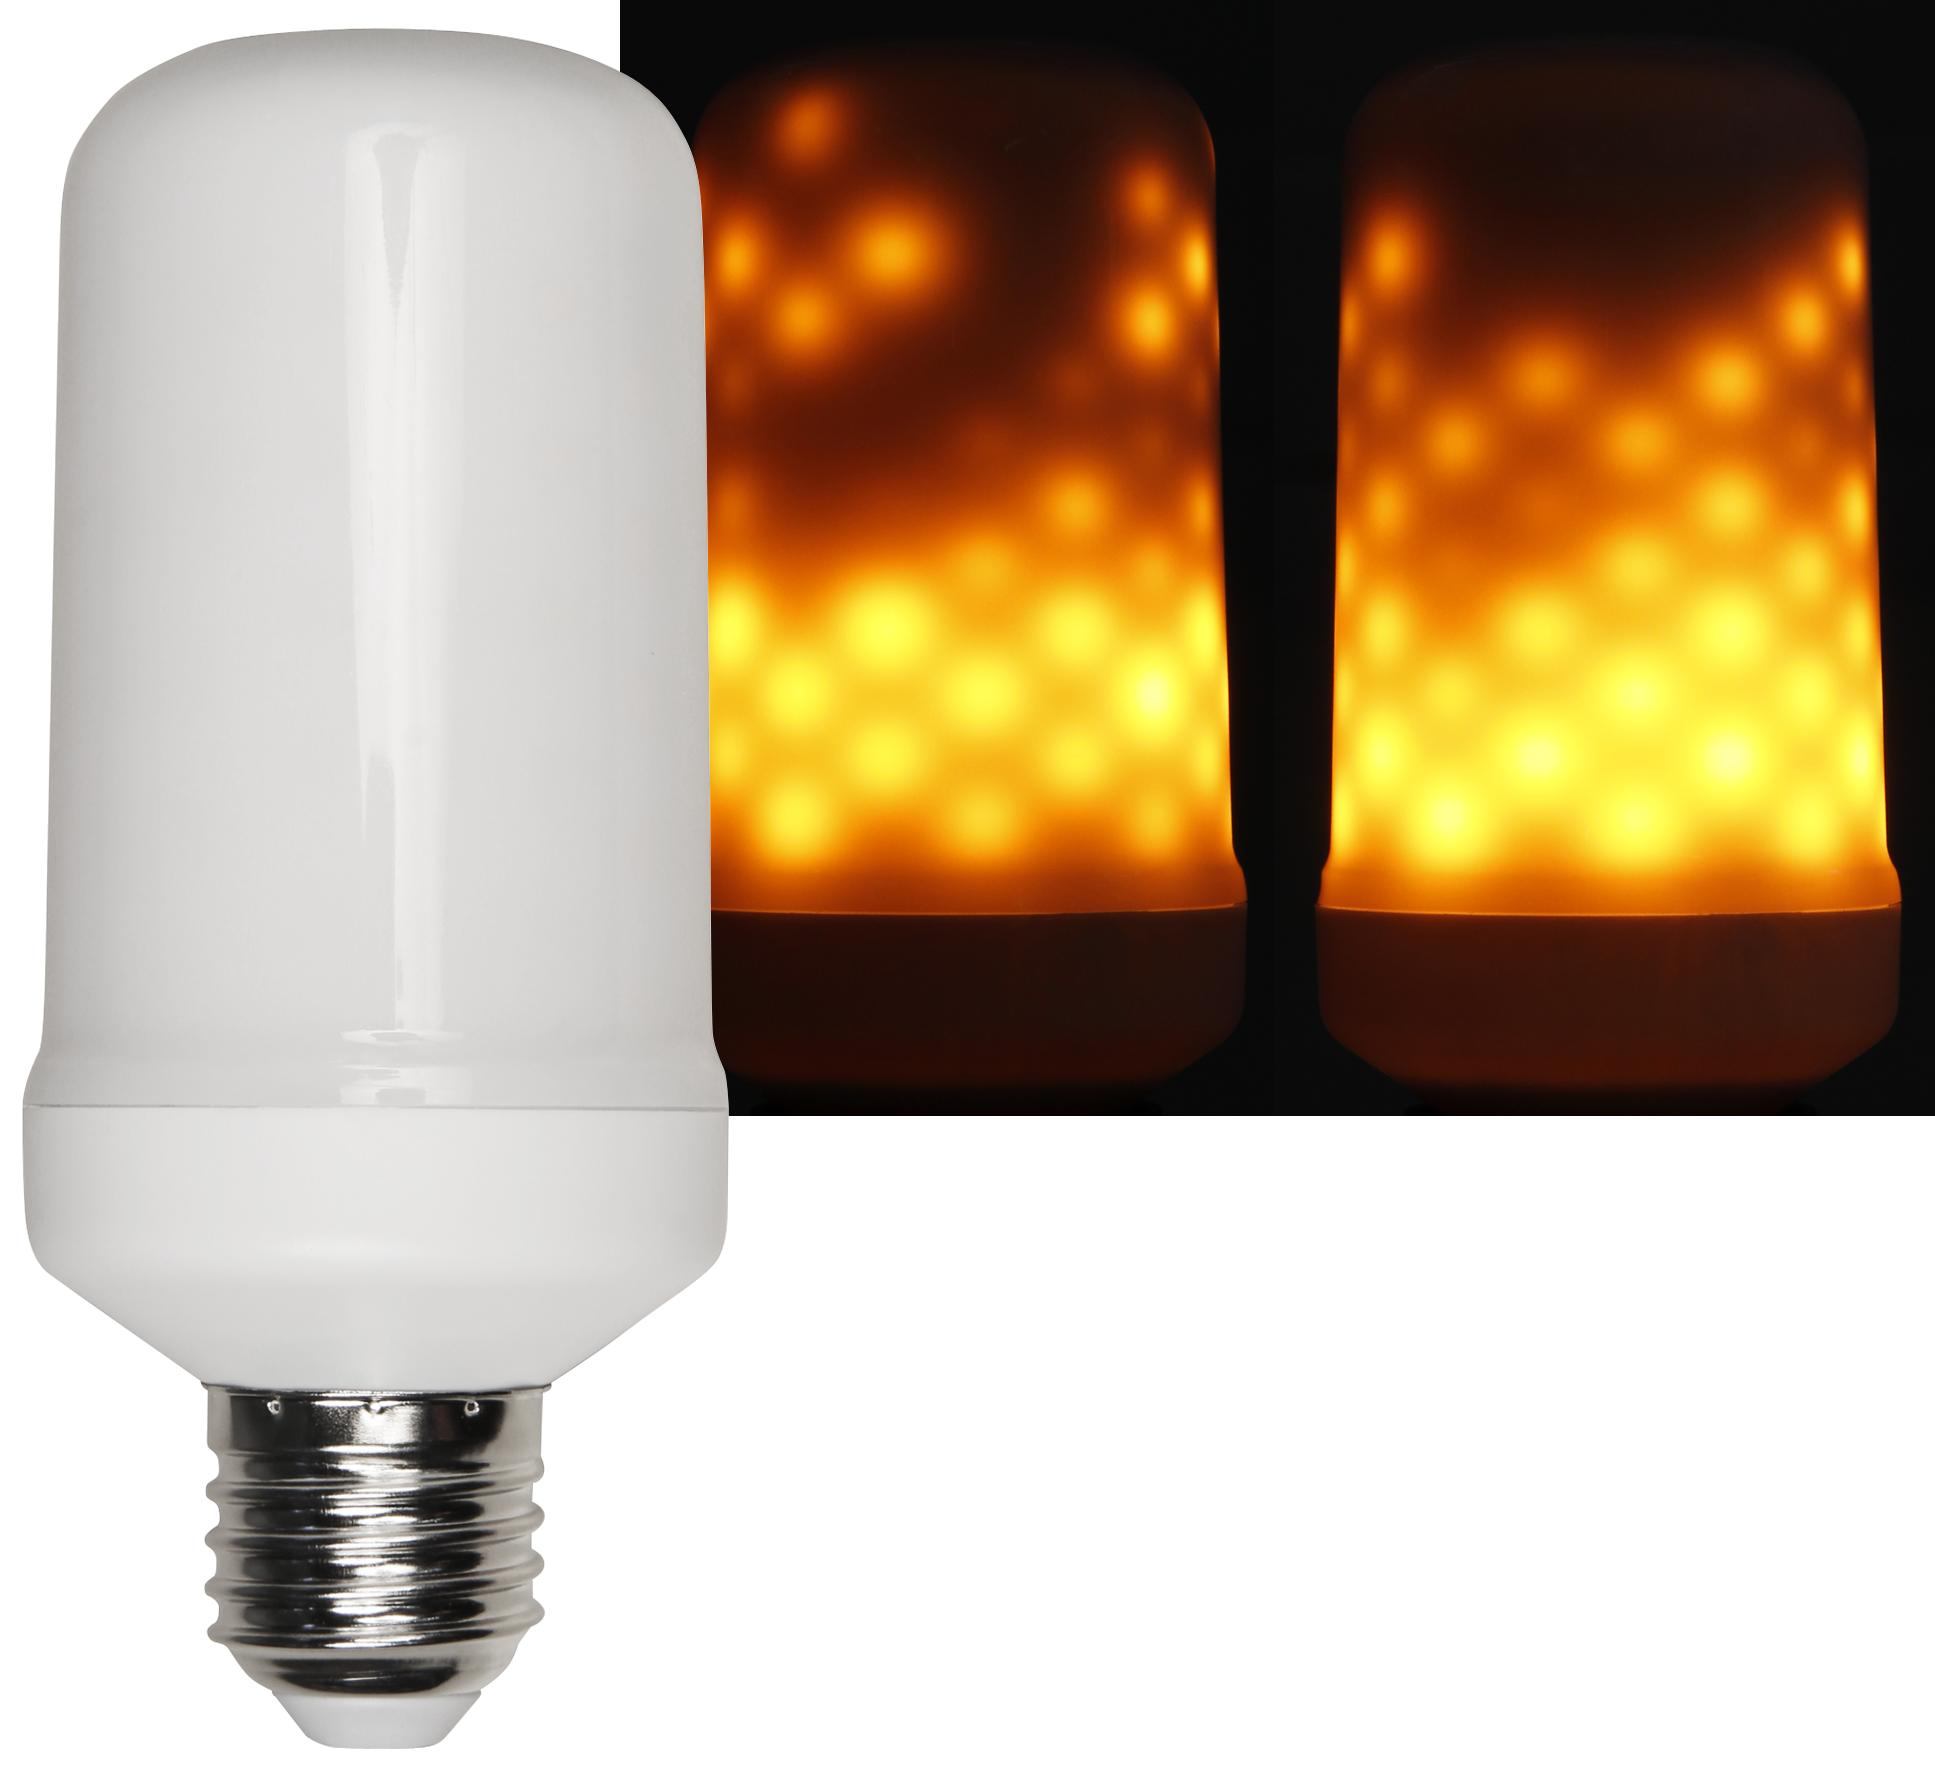 LED Flammen-Lampe McShine, Schwerkraft-Sensor, 3 Modi, 5W, 1300K